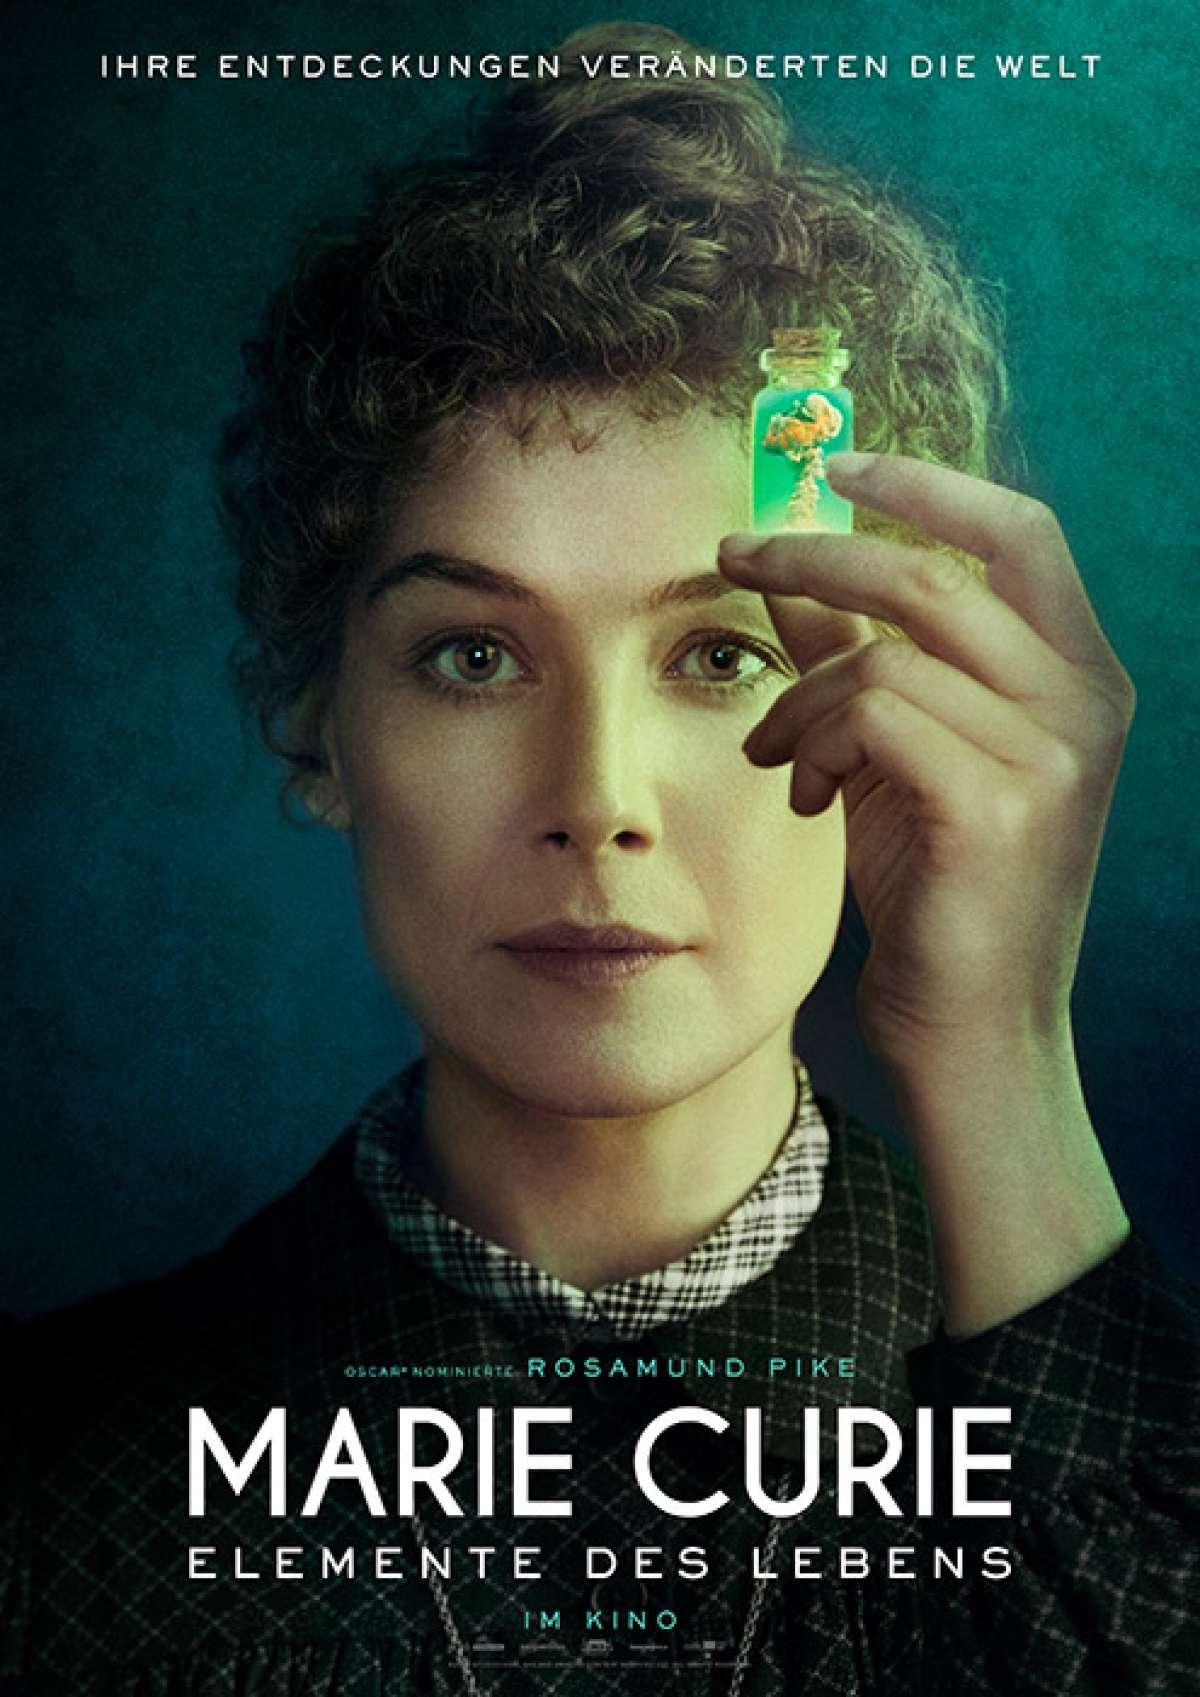 Marie Curie - Elemente des Lebens - Cineplex  - Kassel